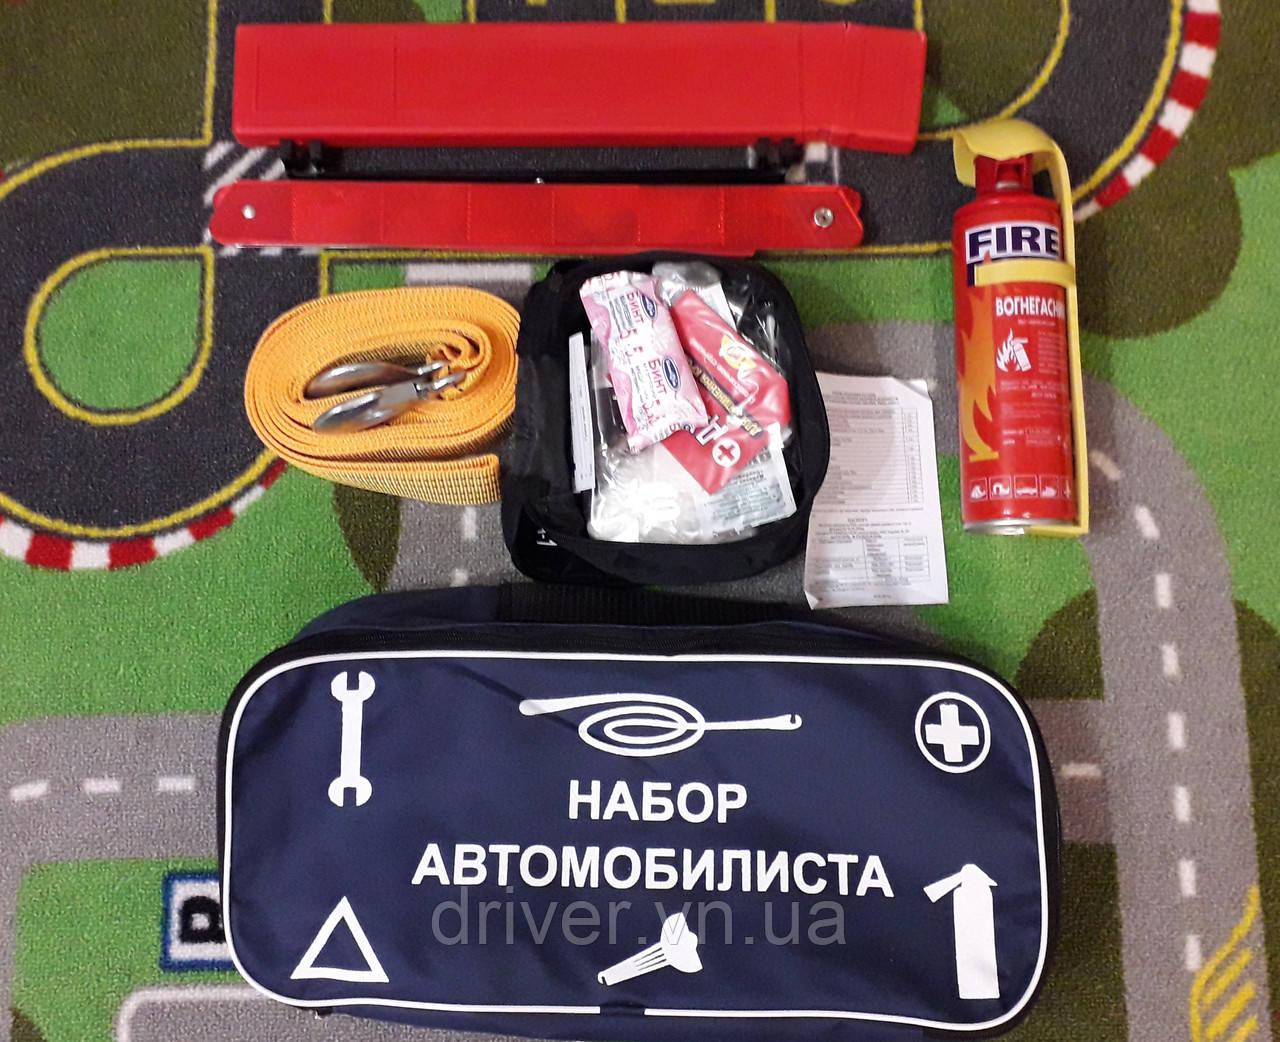 Набір автомобіліста Укрстандарт №1.